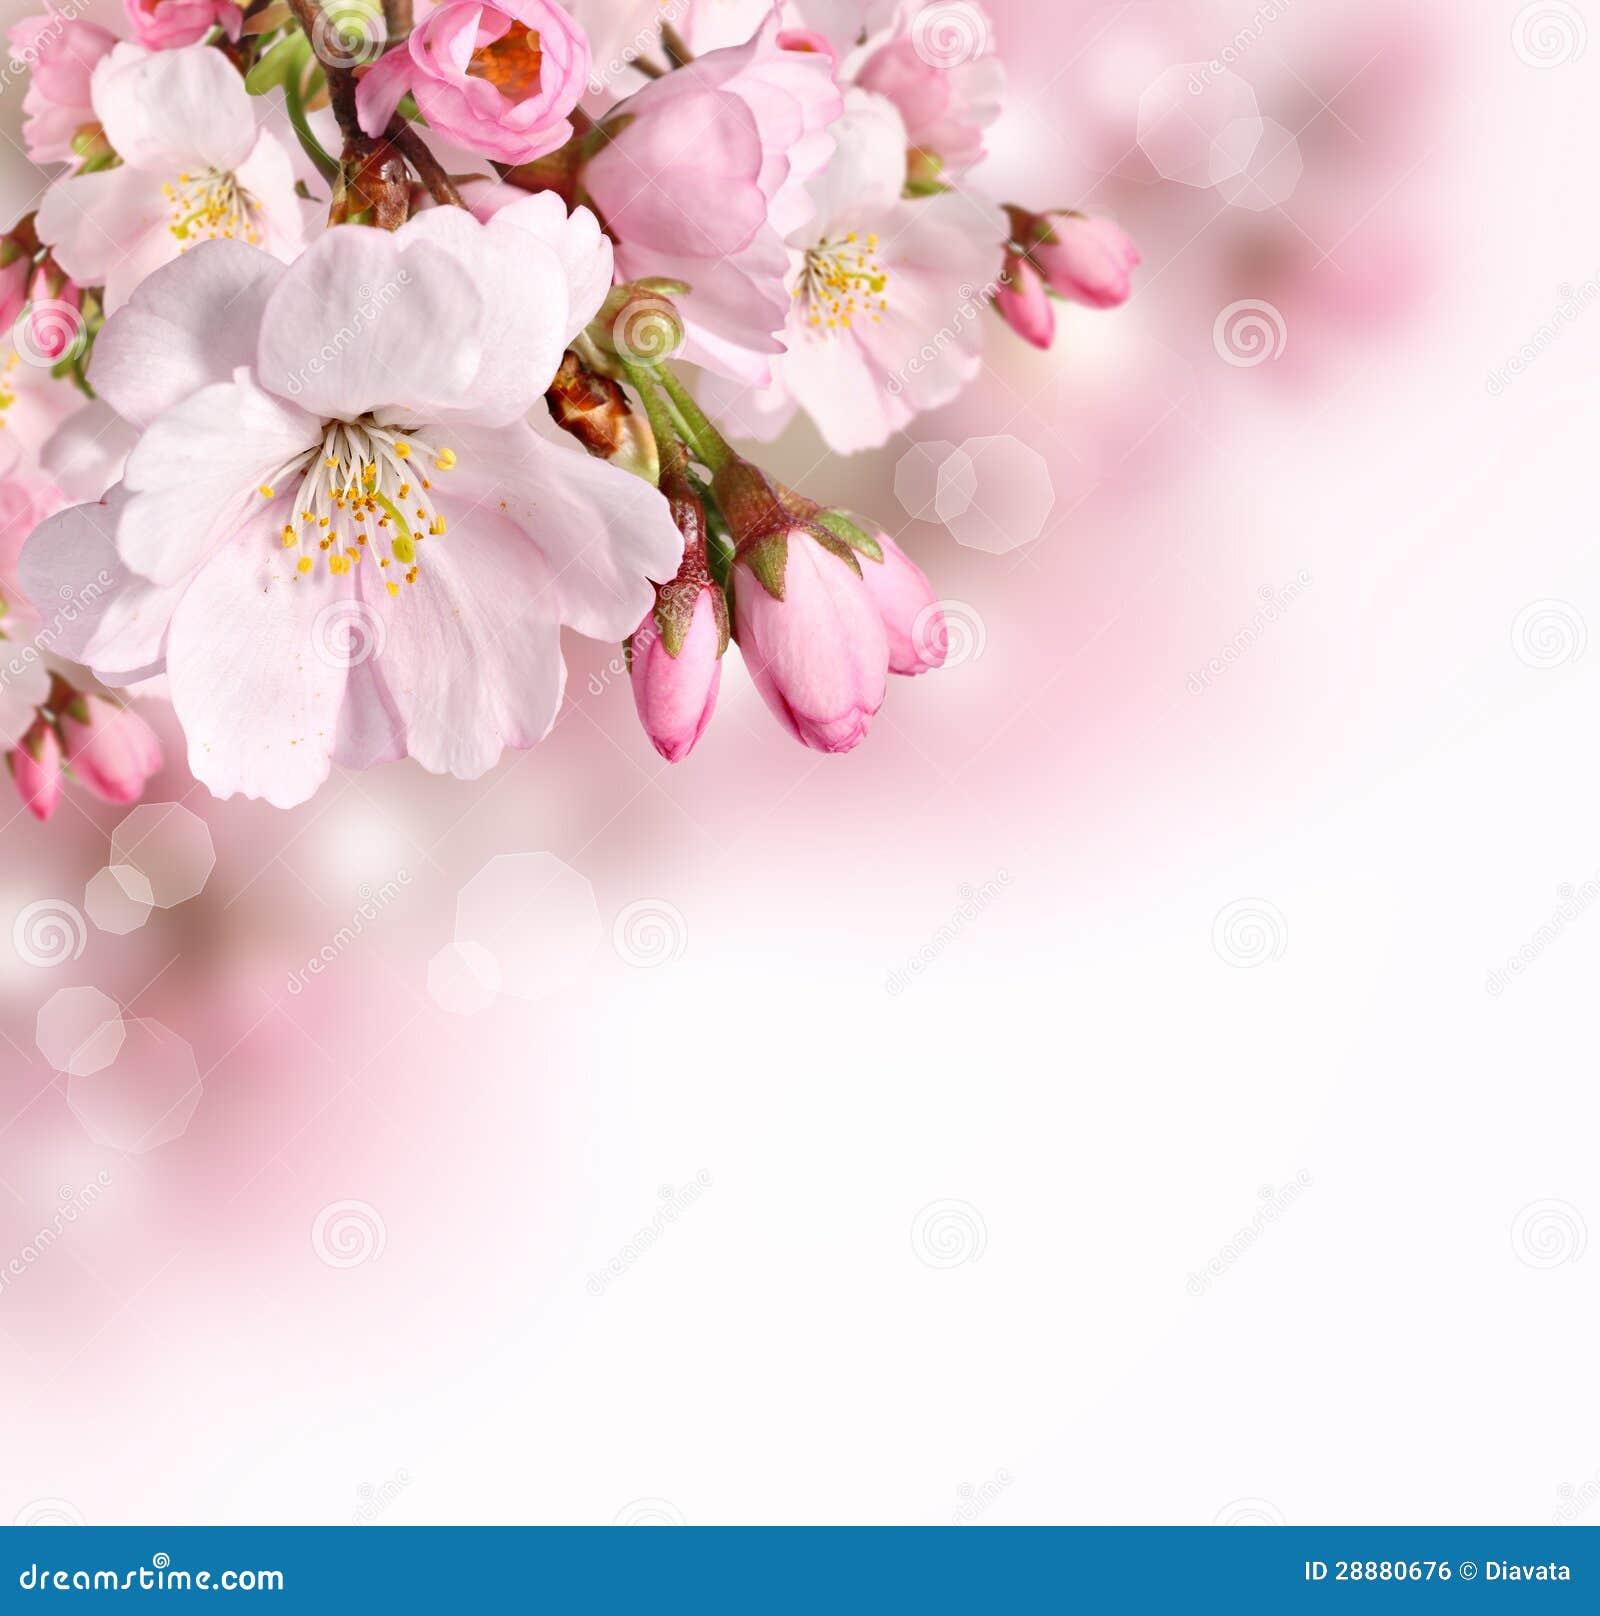 spring border background with pink blossom stock photo. Black Bedroom Furniture Sets. Home Design Ideas